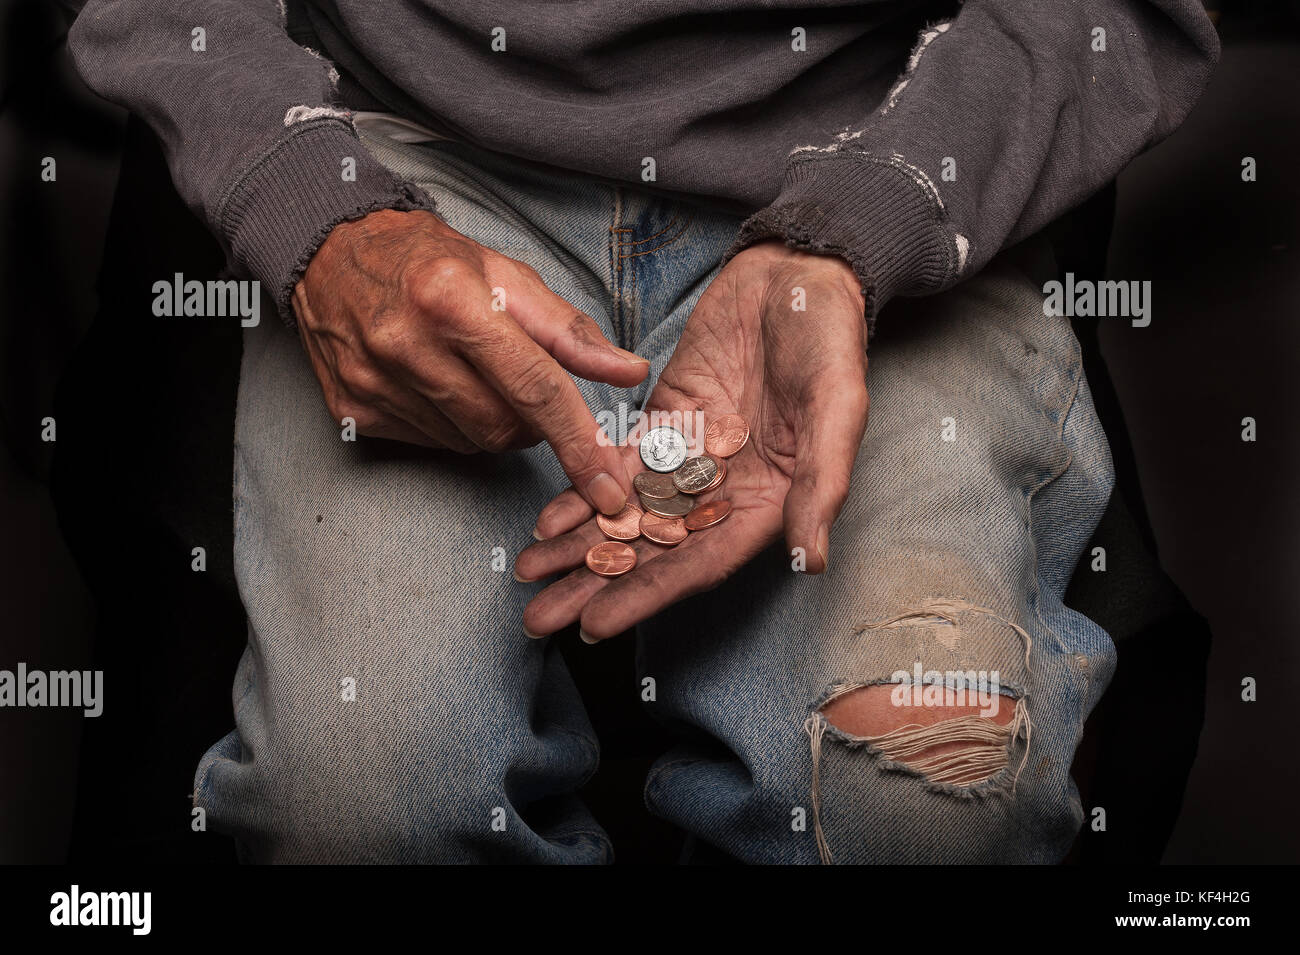 Broke and homeless - Stock Image